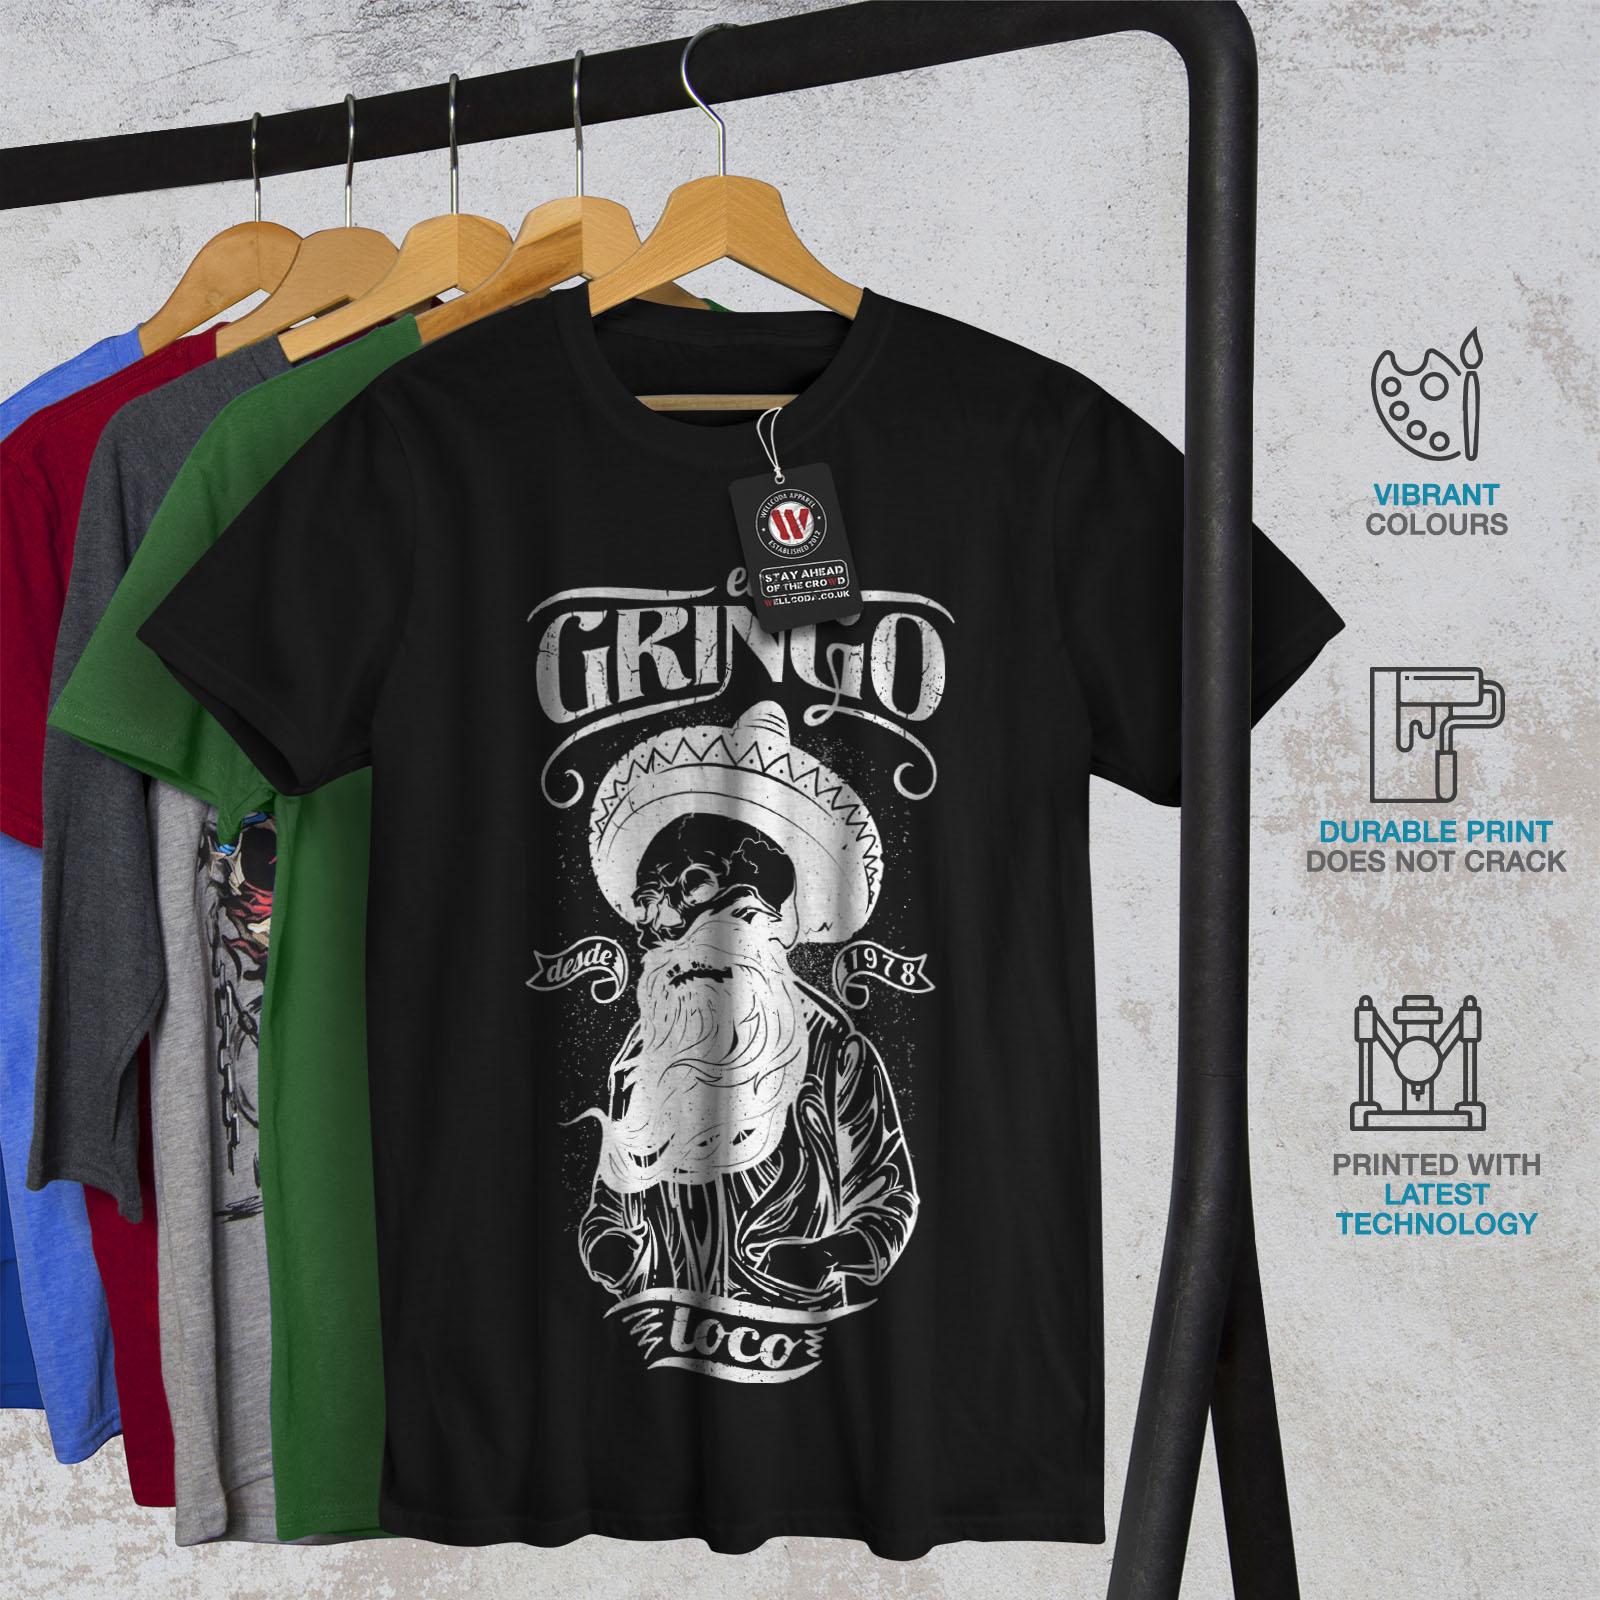 Wellcoda-Gringo-Beard-Skull-Mens-T-shirt-Mexico-Graphic-Design-Printed-Tee thumbnail 6